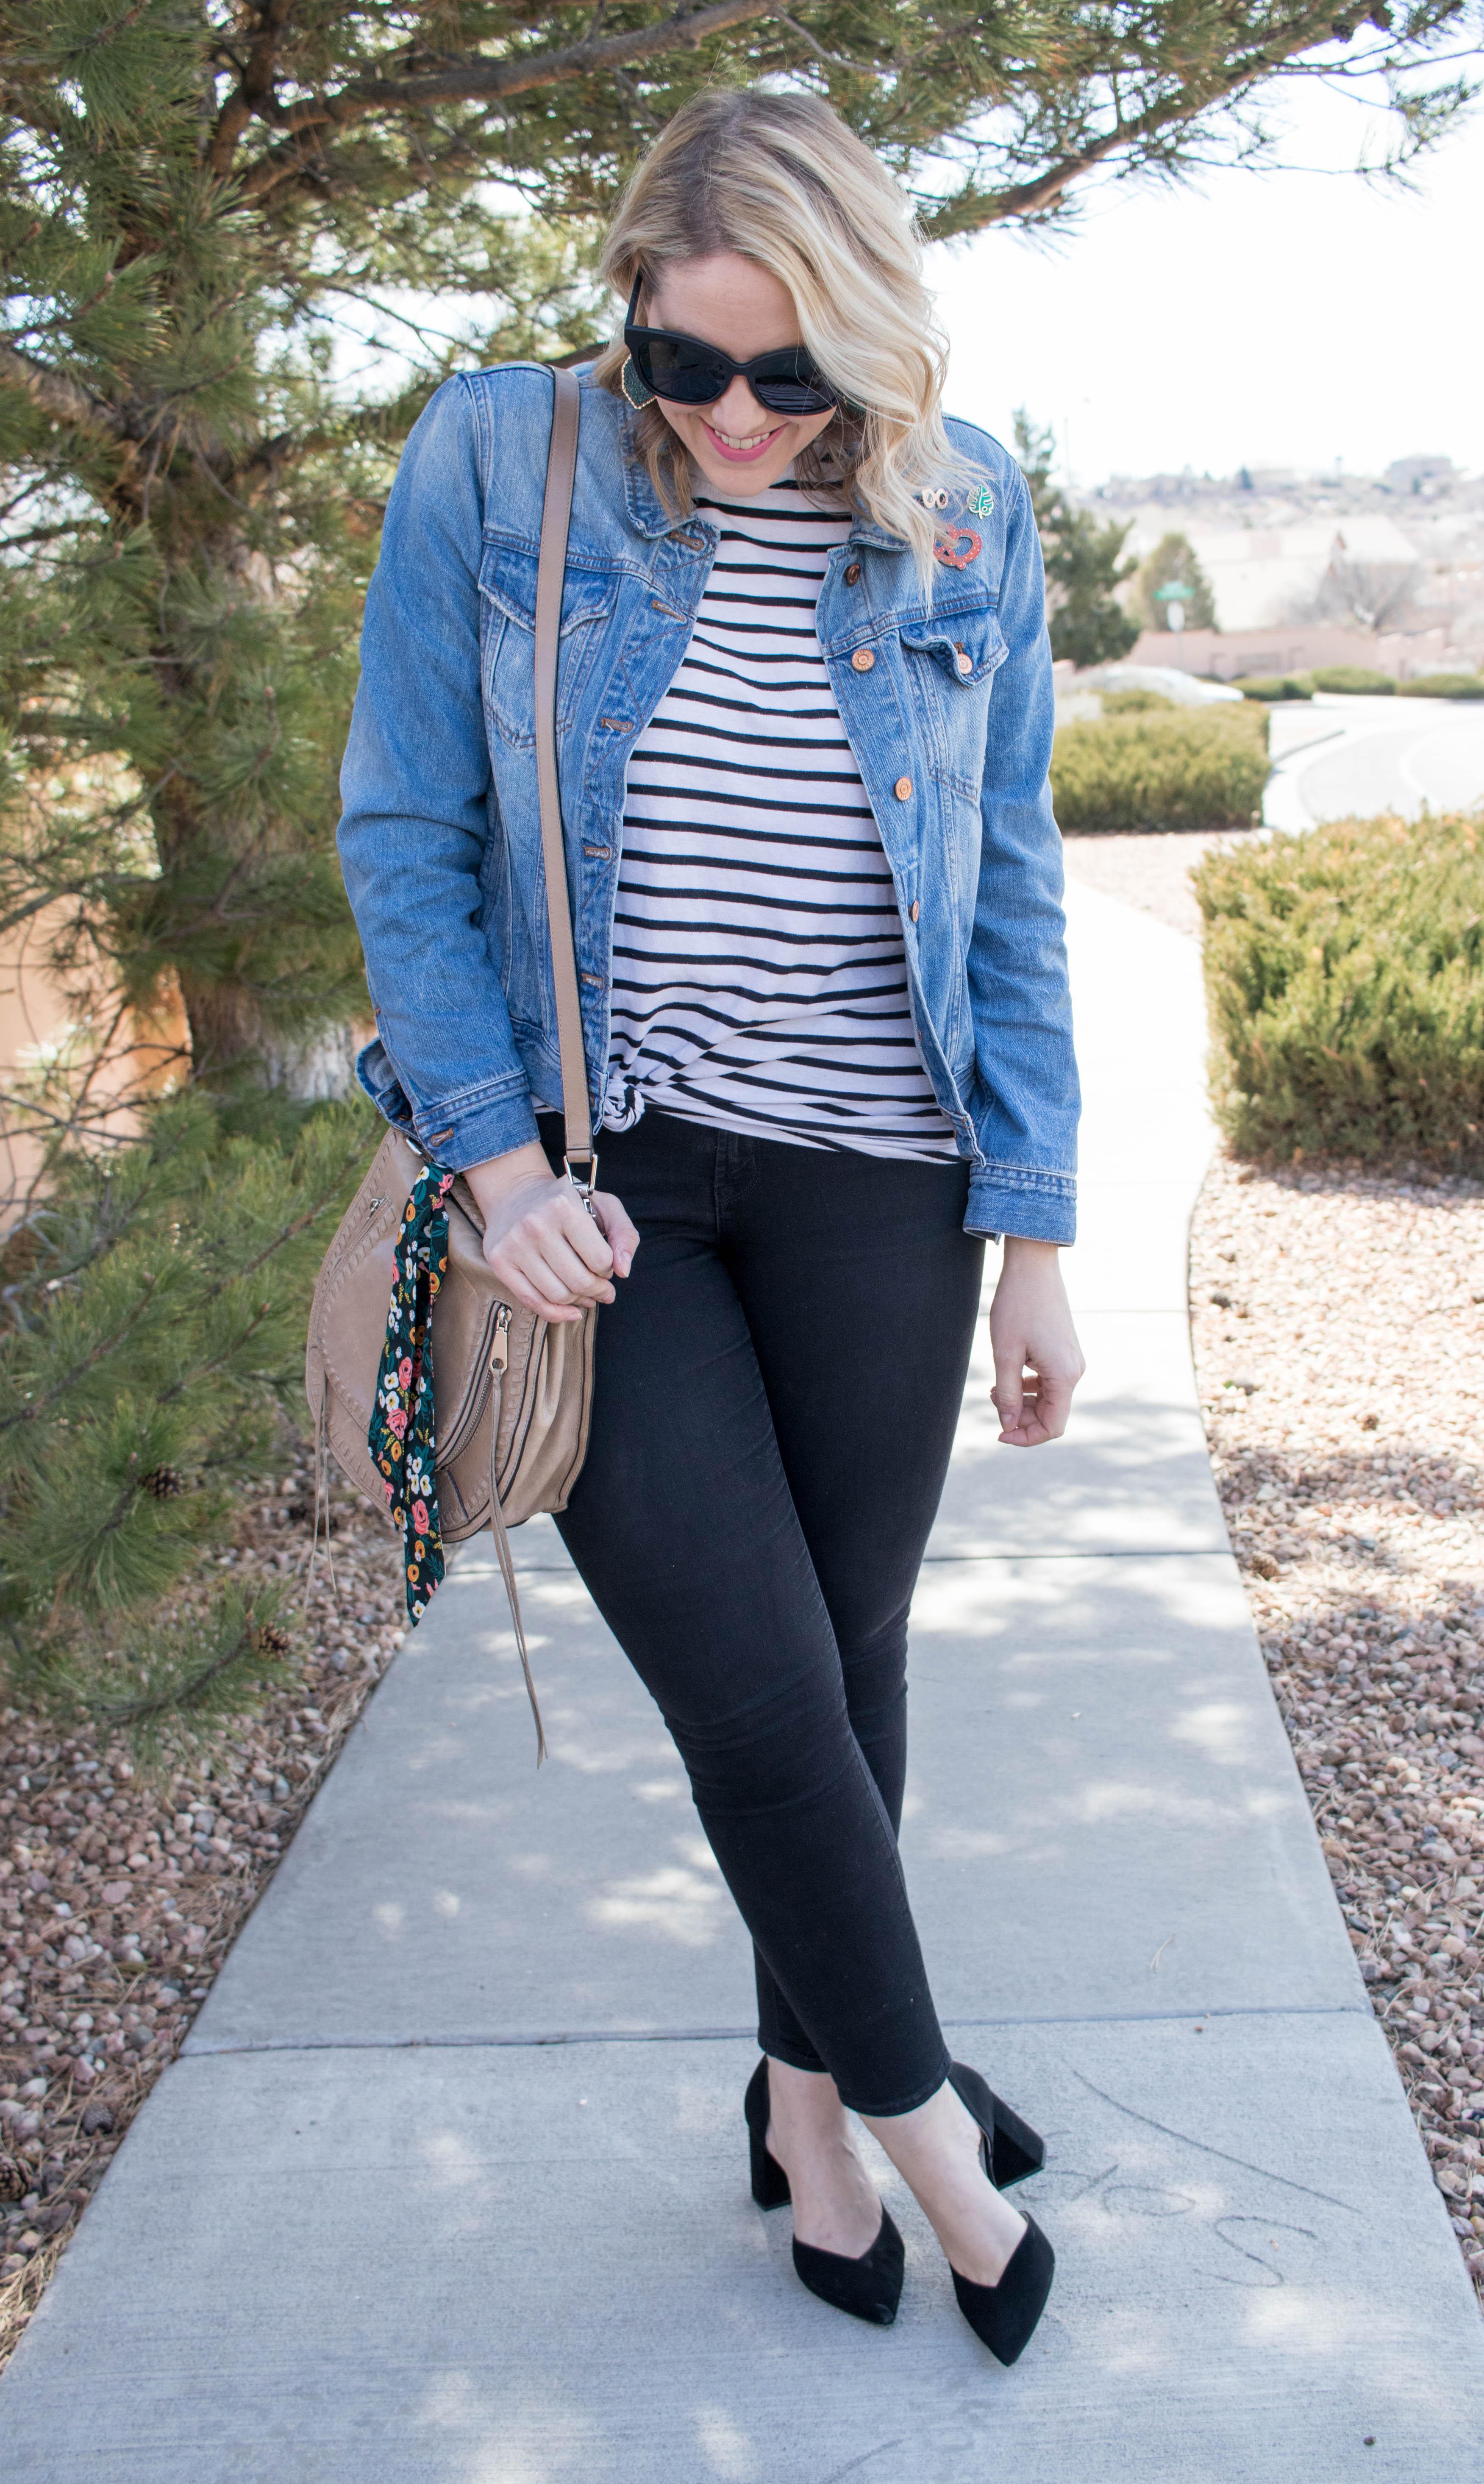 old navy rockstar jeans jcrew denim jacket outfit #oldnavystyle #springstyle #fashionblogger